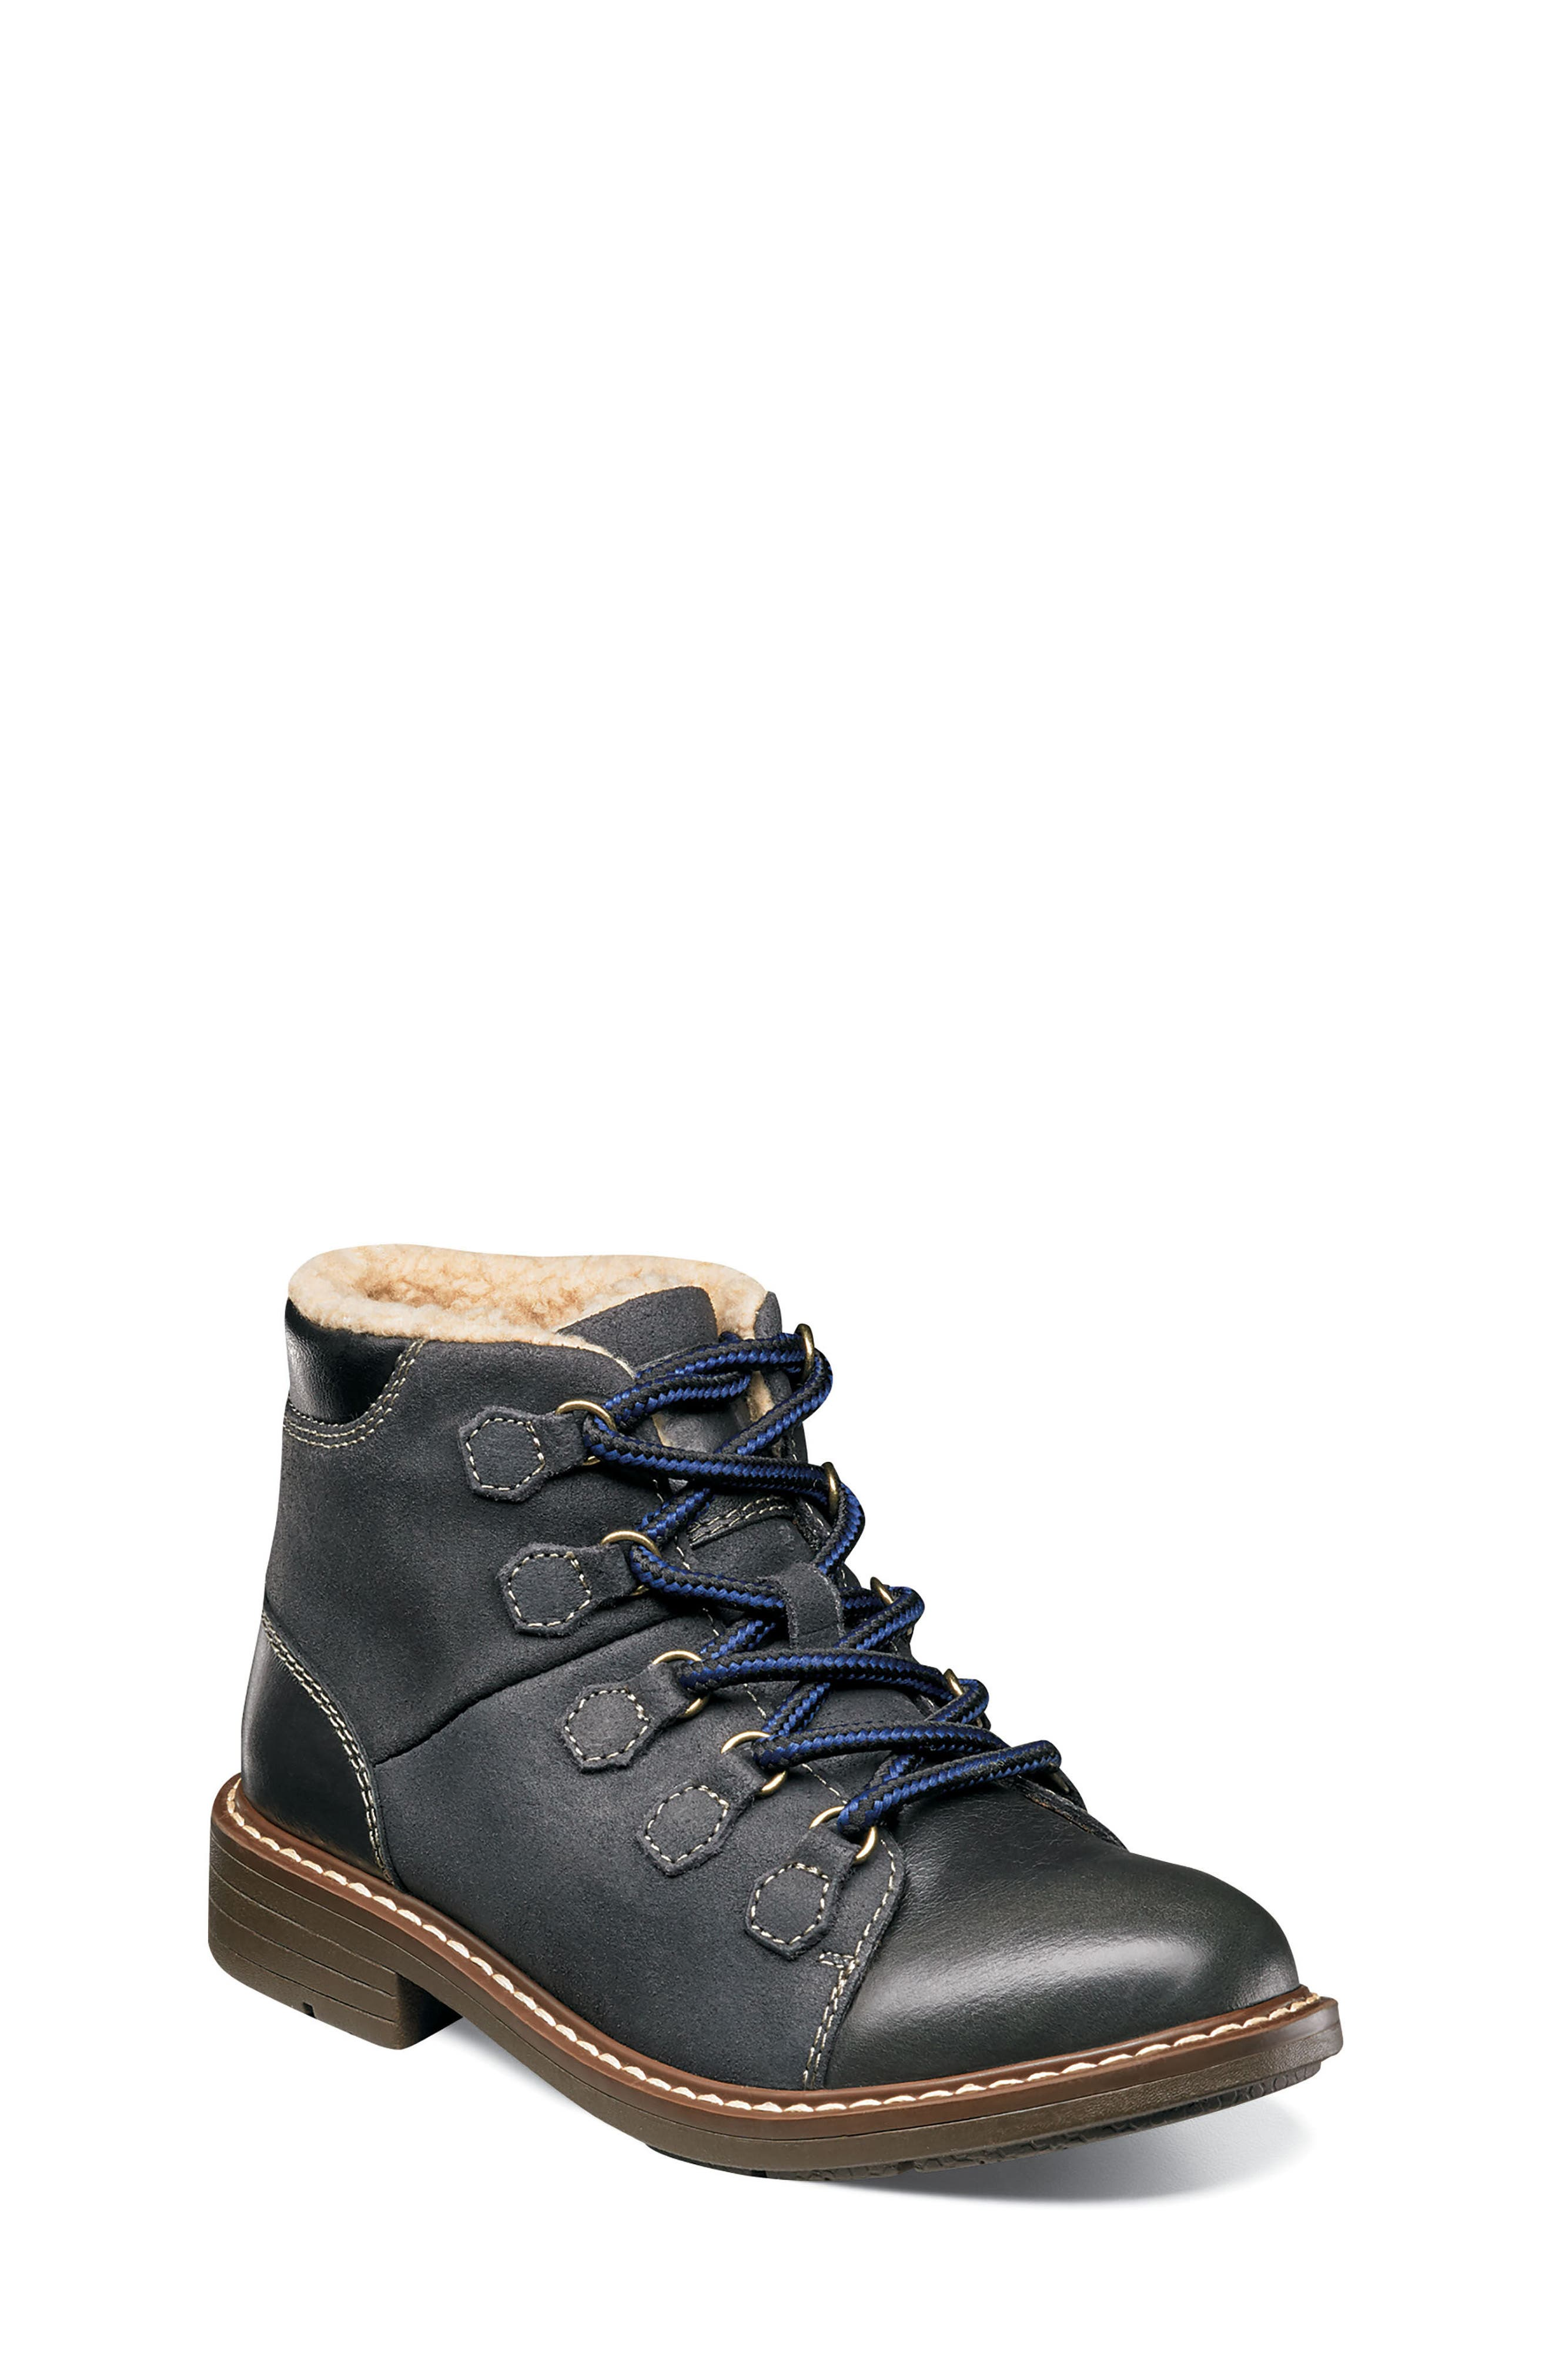 Studio Alpine Plush Lined Boot,                             Main thumbnail 1, color,